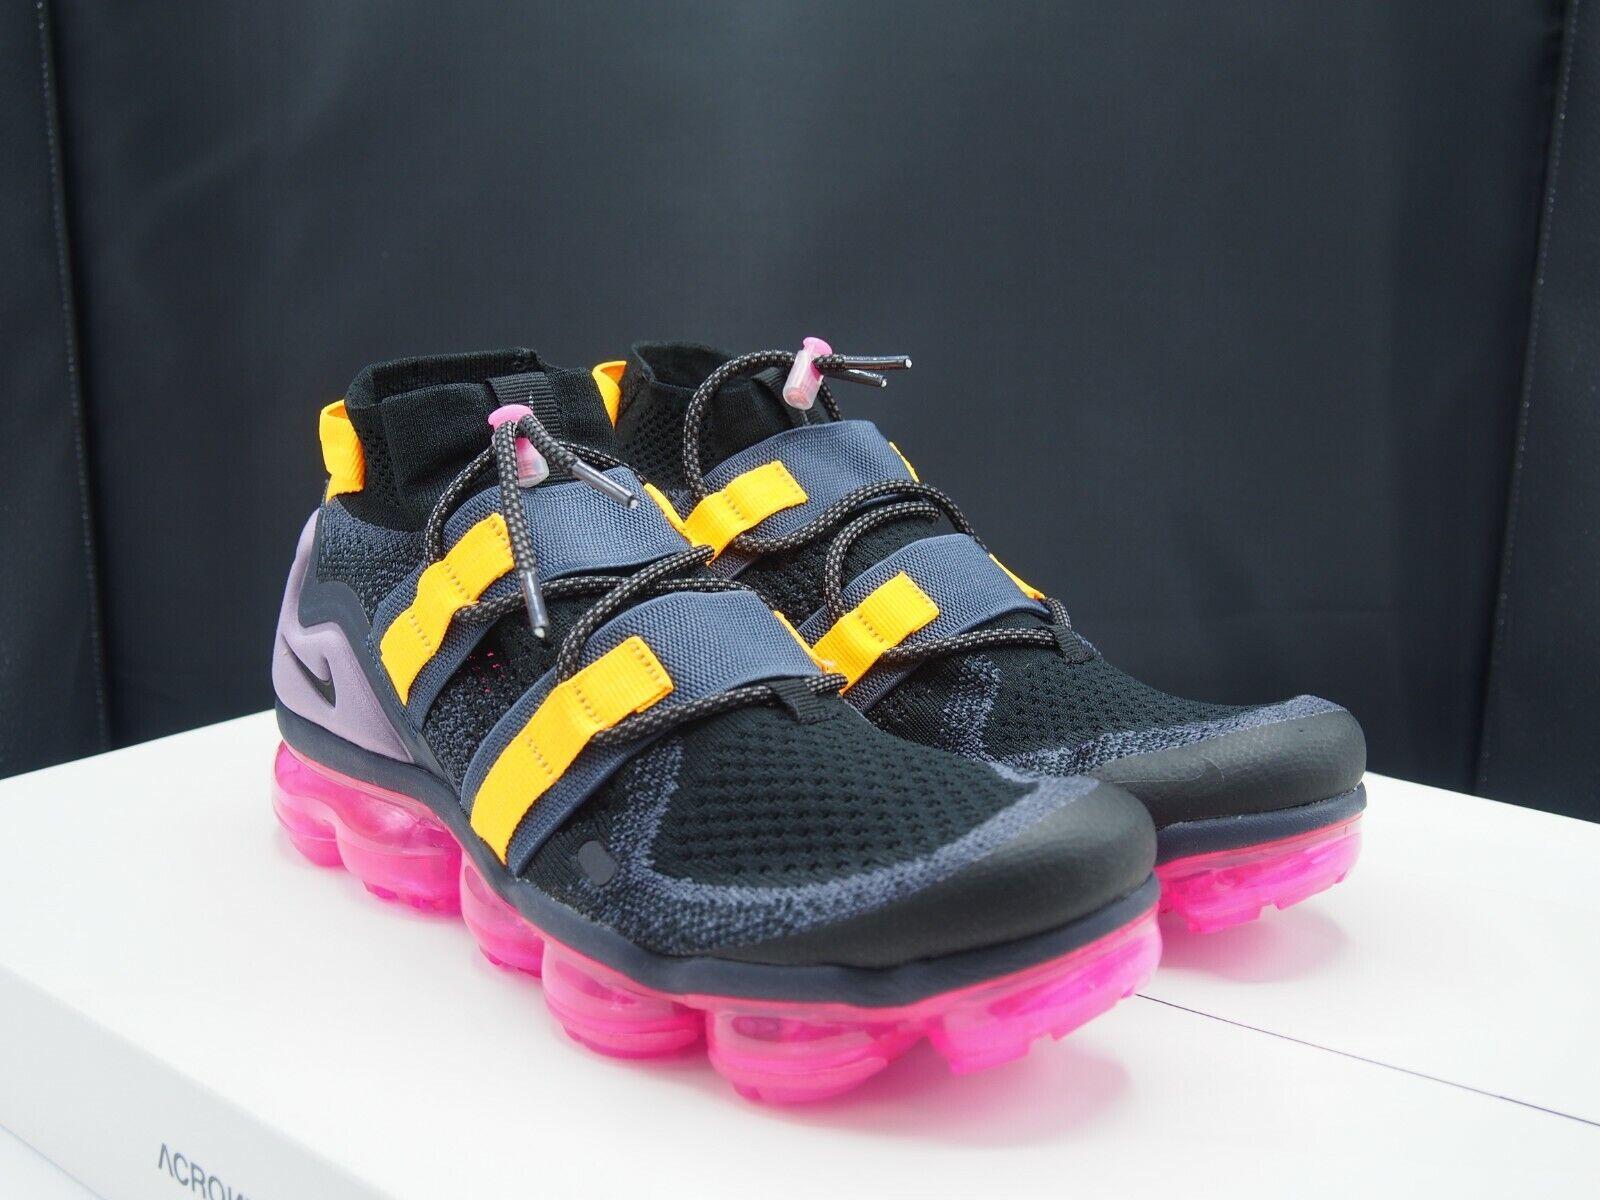 a0373f905ce4 Nike Nike Nike Air VaporMax Flyknit Utility AH6834-006 Men s size 9.5 US  6079ab